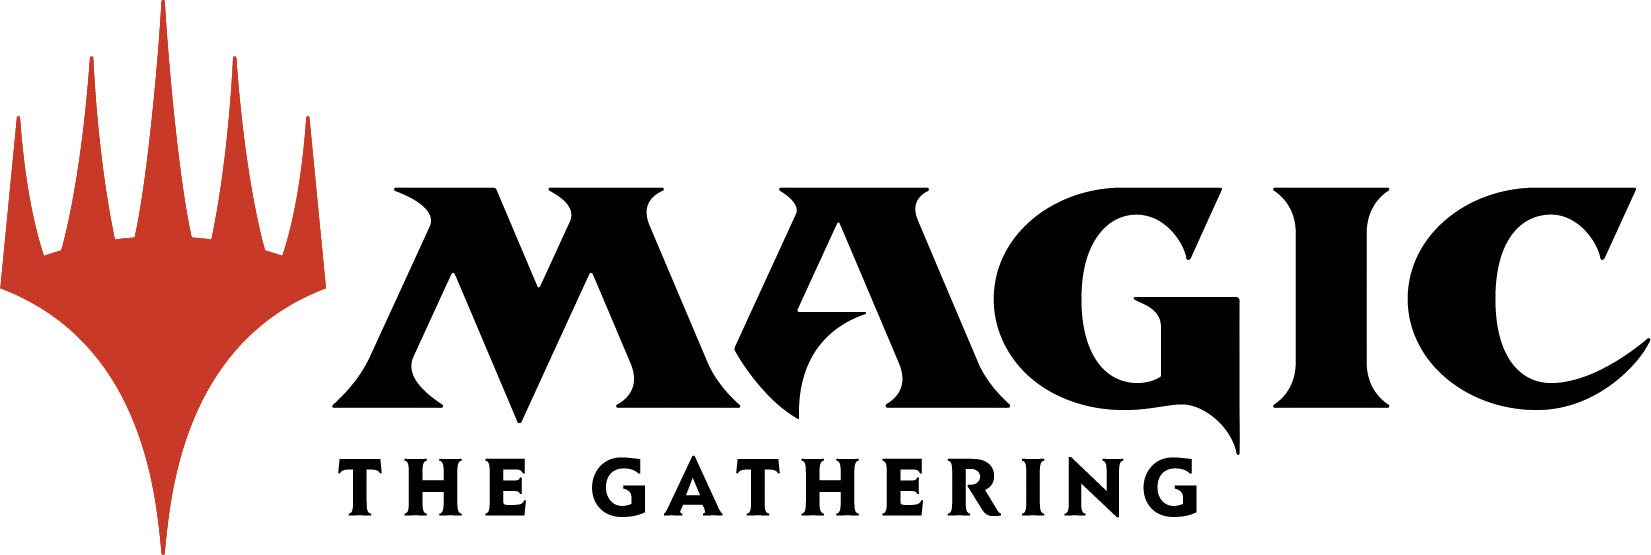 Magic The Gathering Ccg: Zendikar Pro Binder 9-pocket